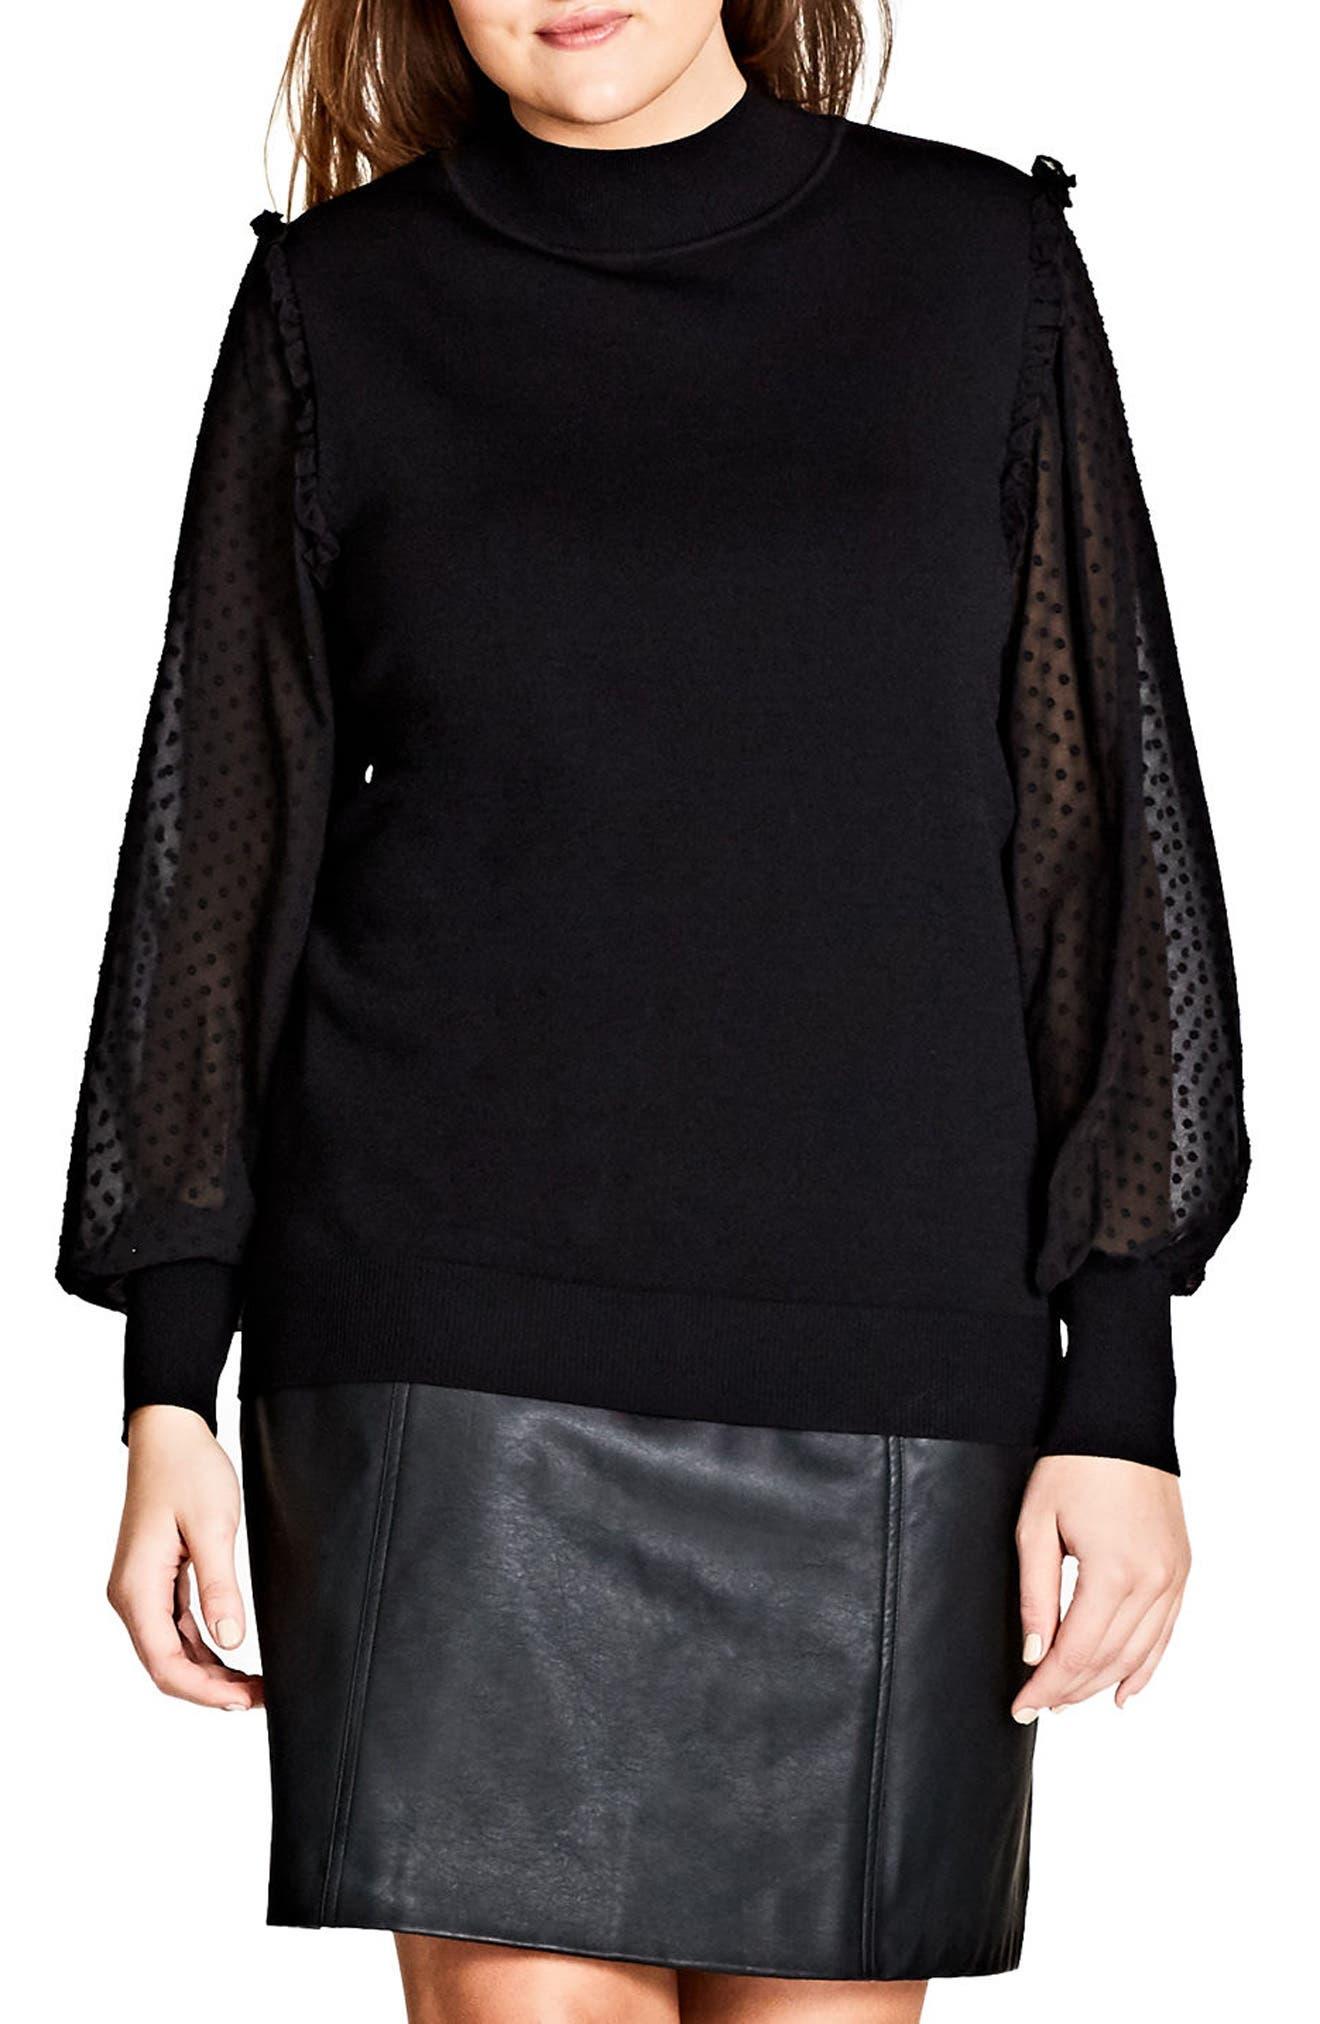 Swiss Dot Sleeve Sweater,                         Main,                         color, 001